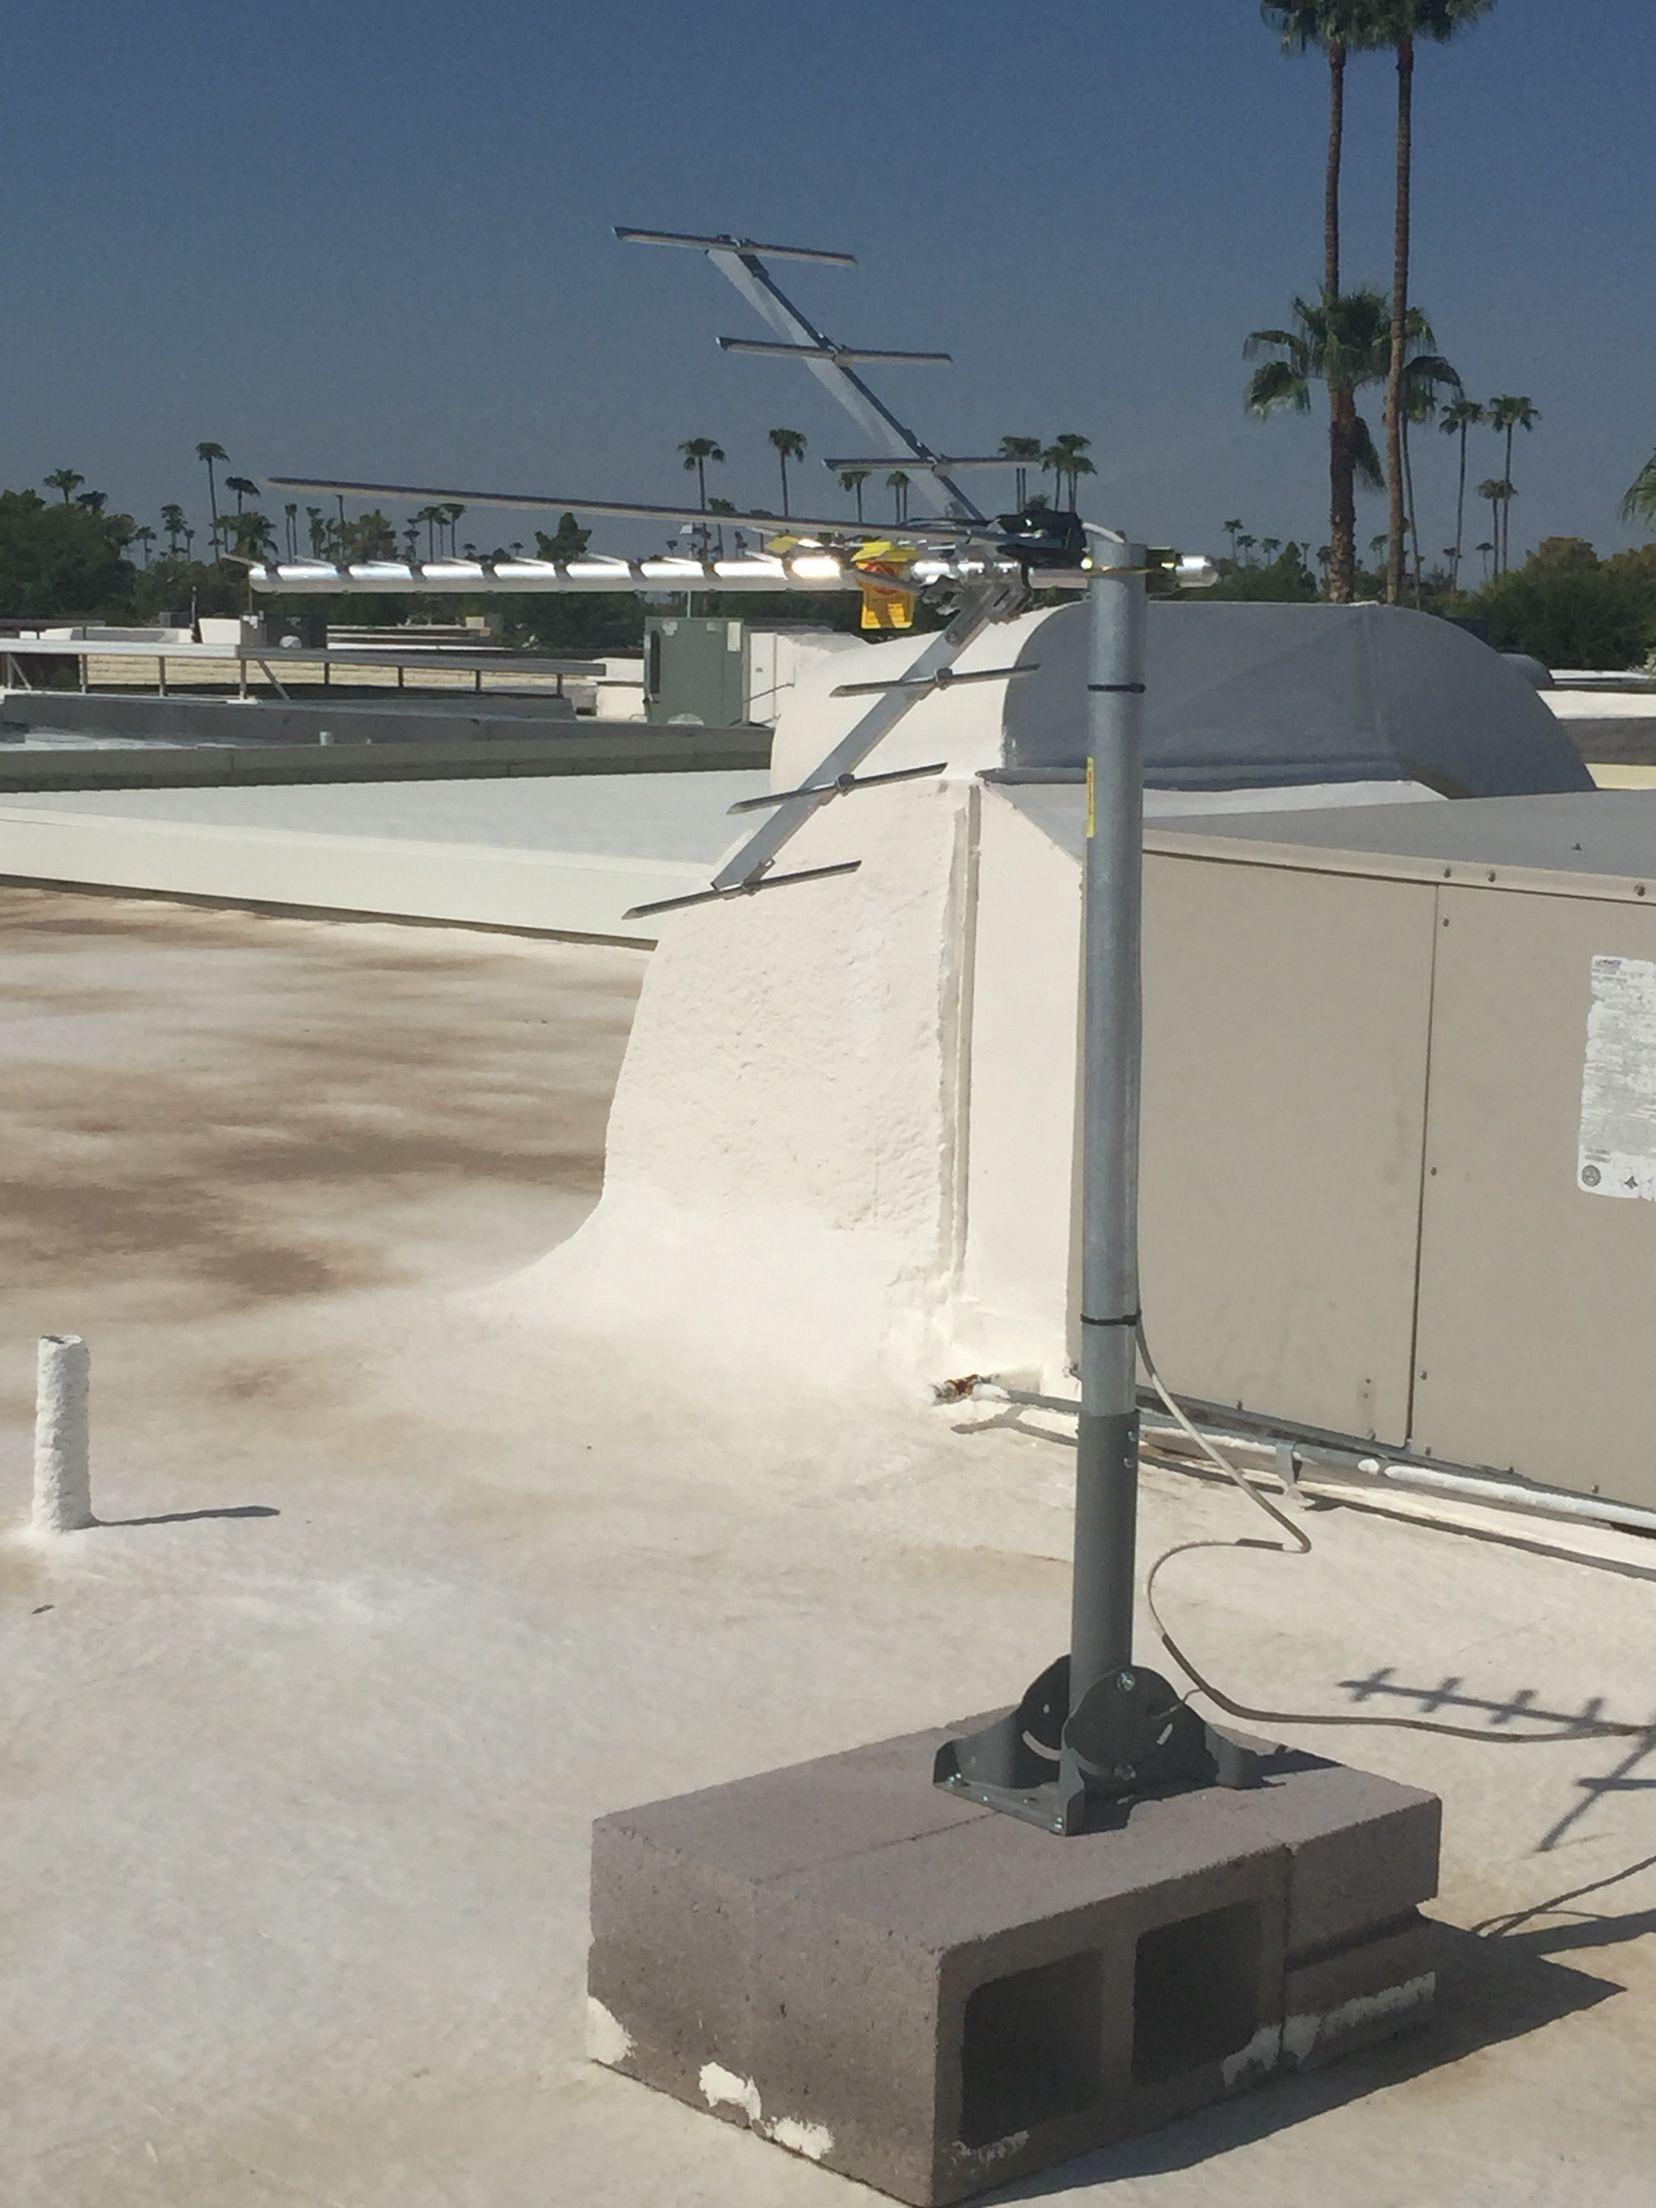 Professional Flat Roof Mounted Hdtv Antenna Installation In Scottsdale Az By Freehdtvaz Www Freehdtvaz Com Hdtv Antenna Flat Roof Installation